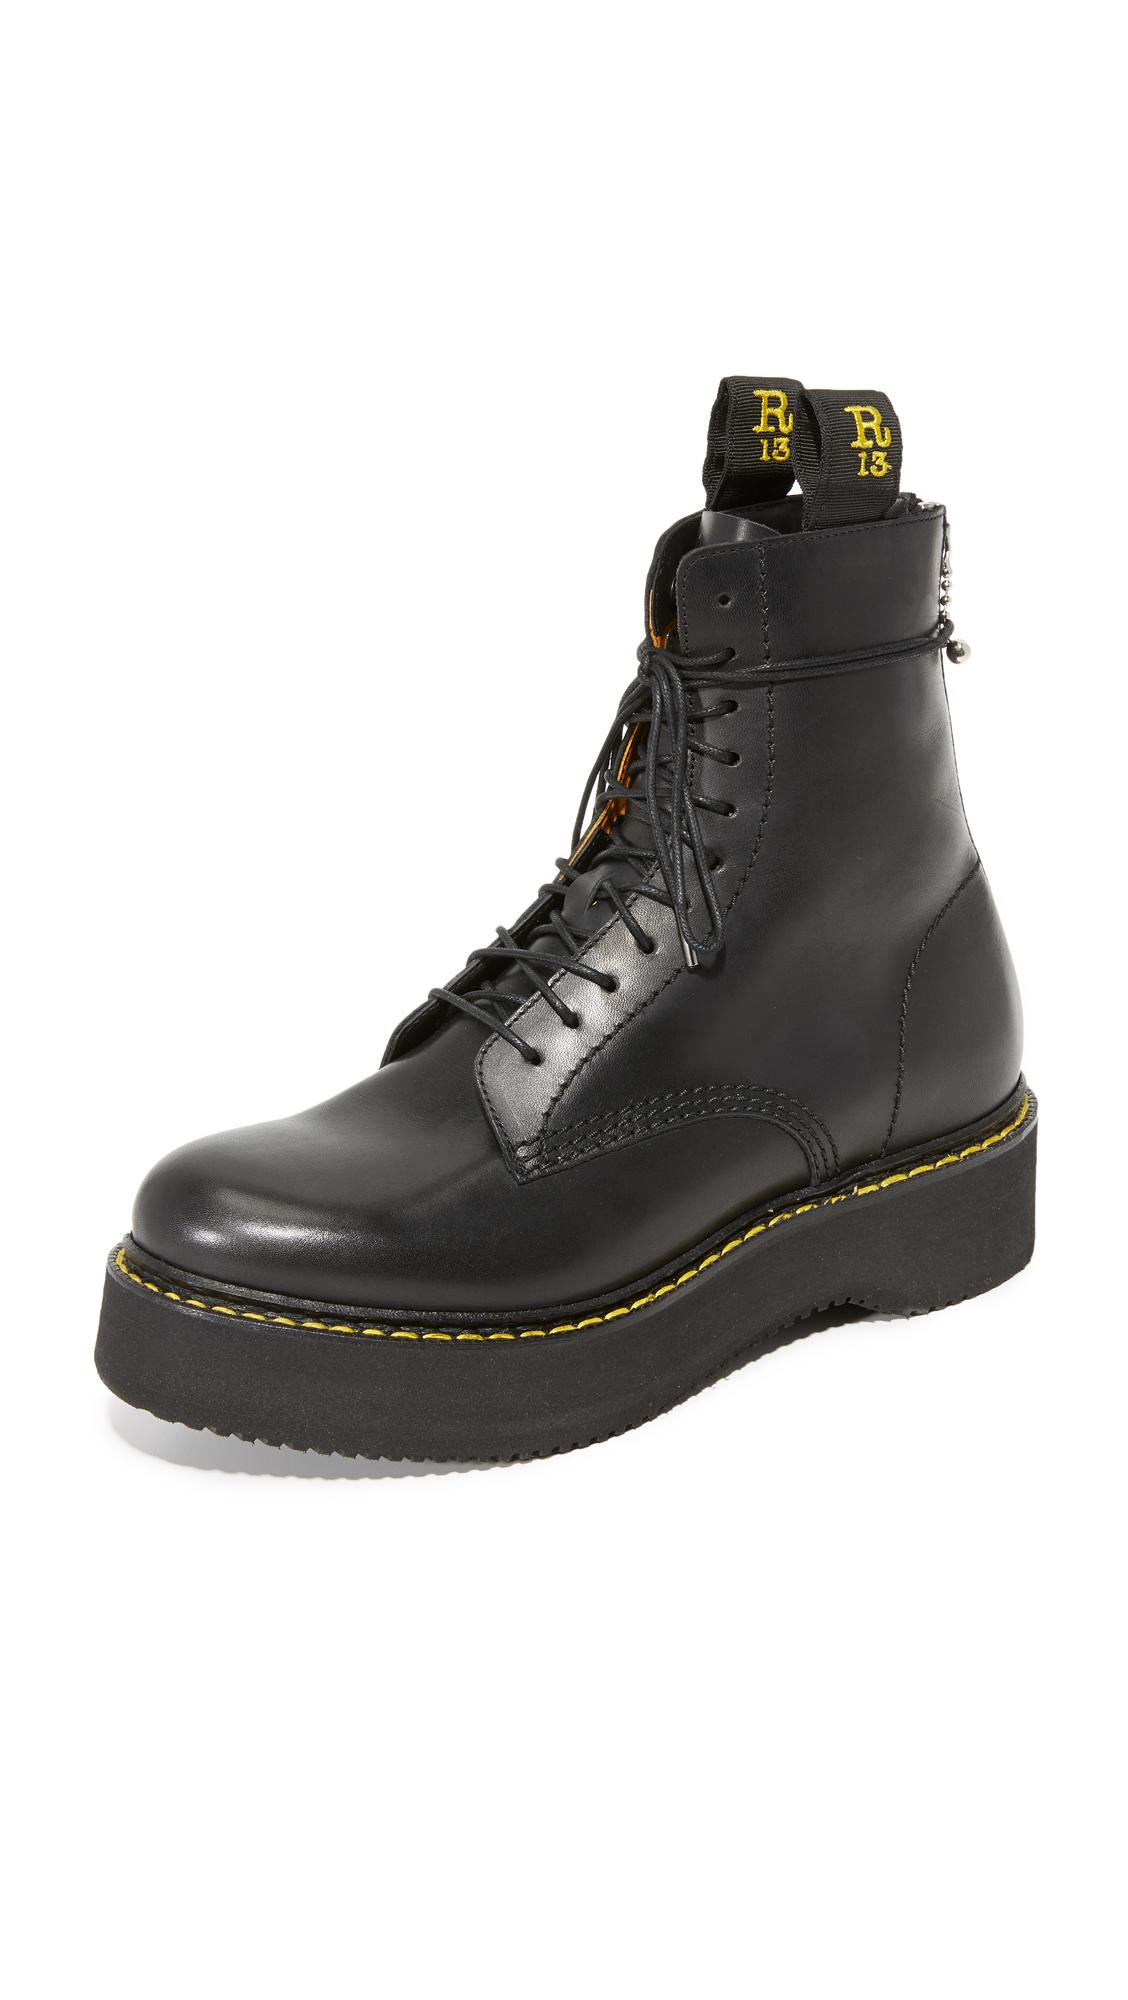 R13 Combat Platform Boots good selling cheap price Fsel5pa